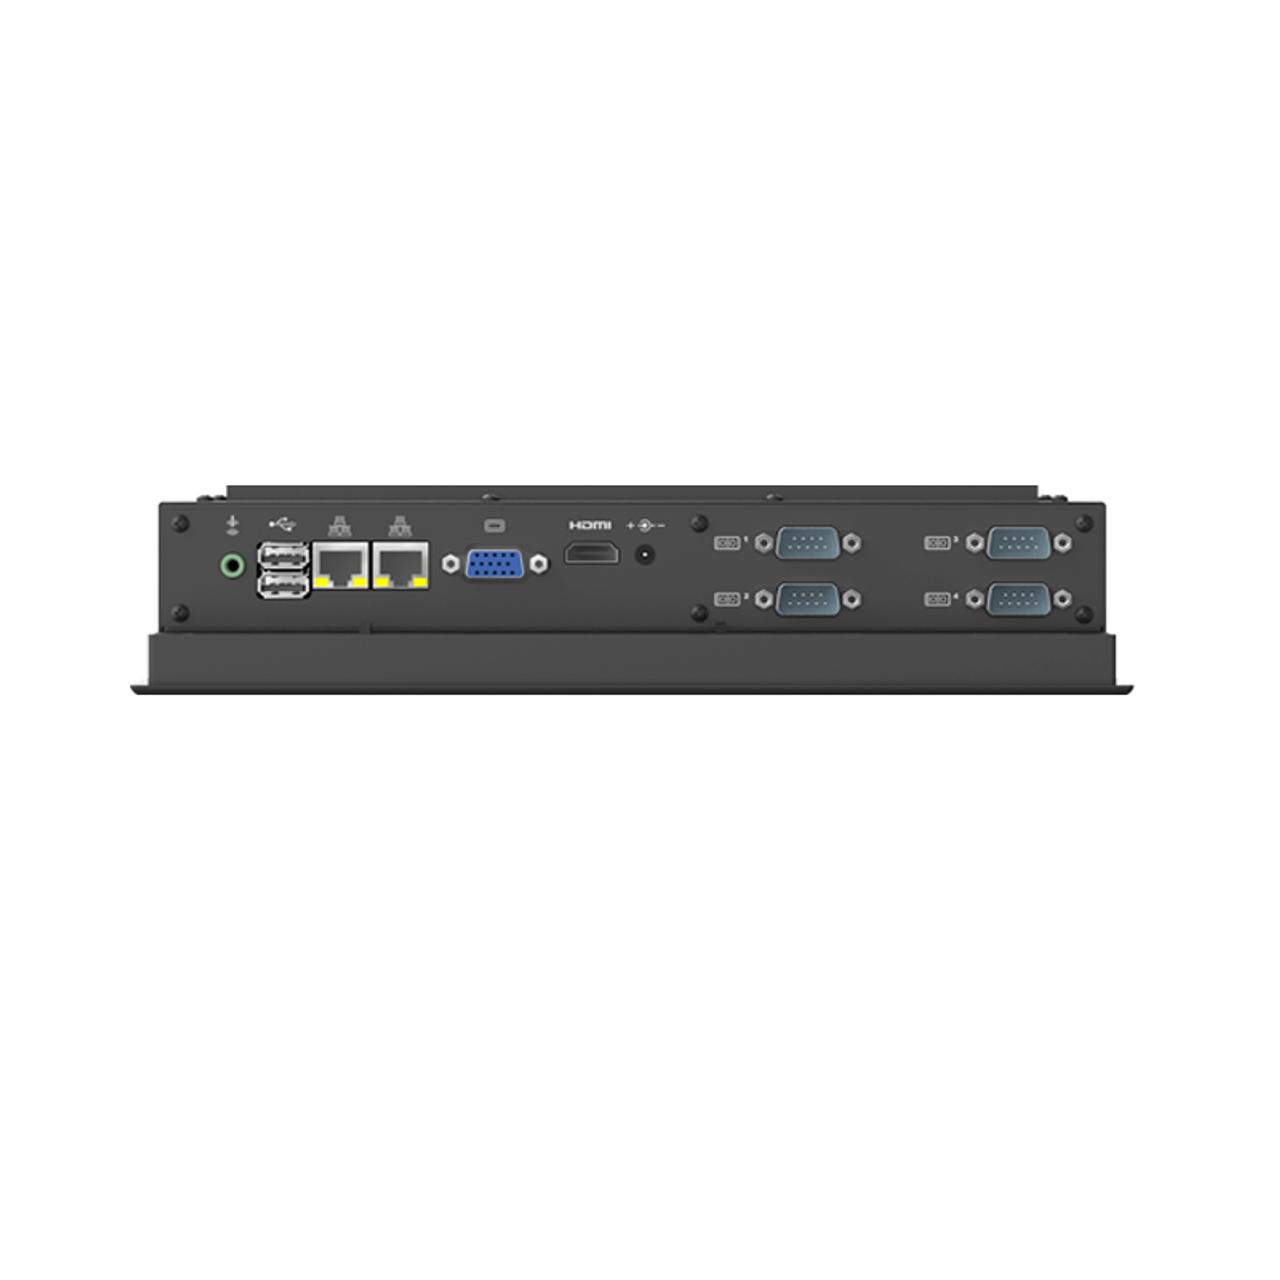 PC-1041/C/T AIO Industrial Computer